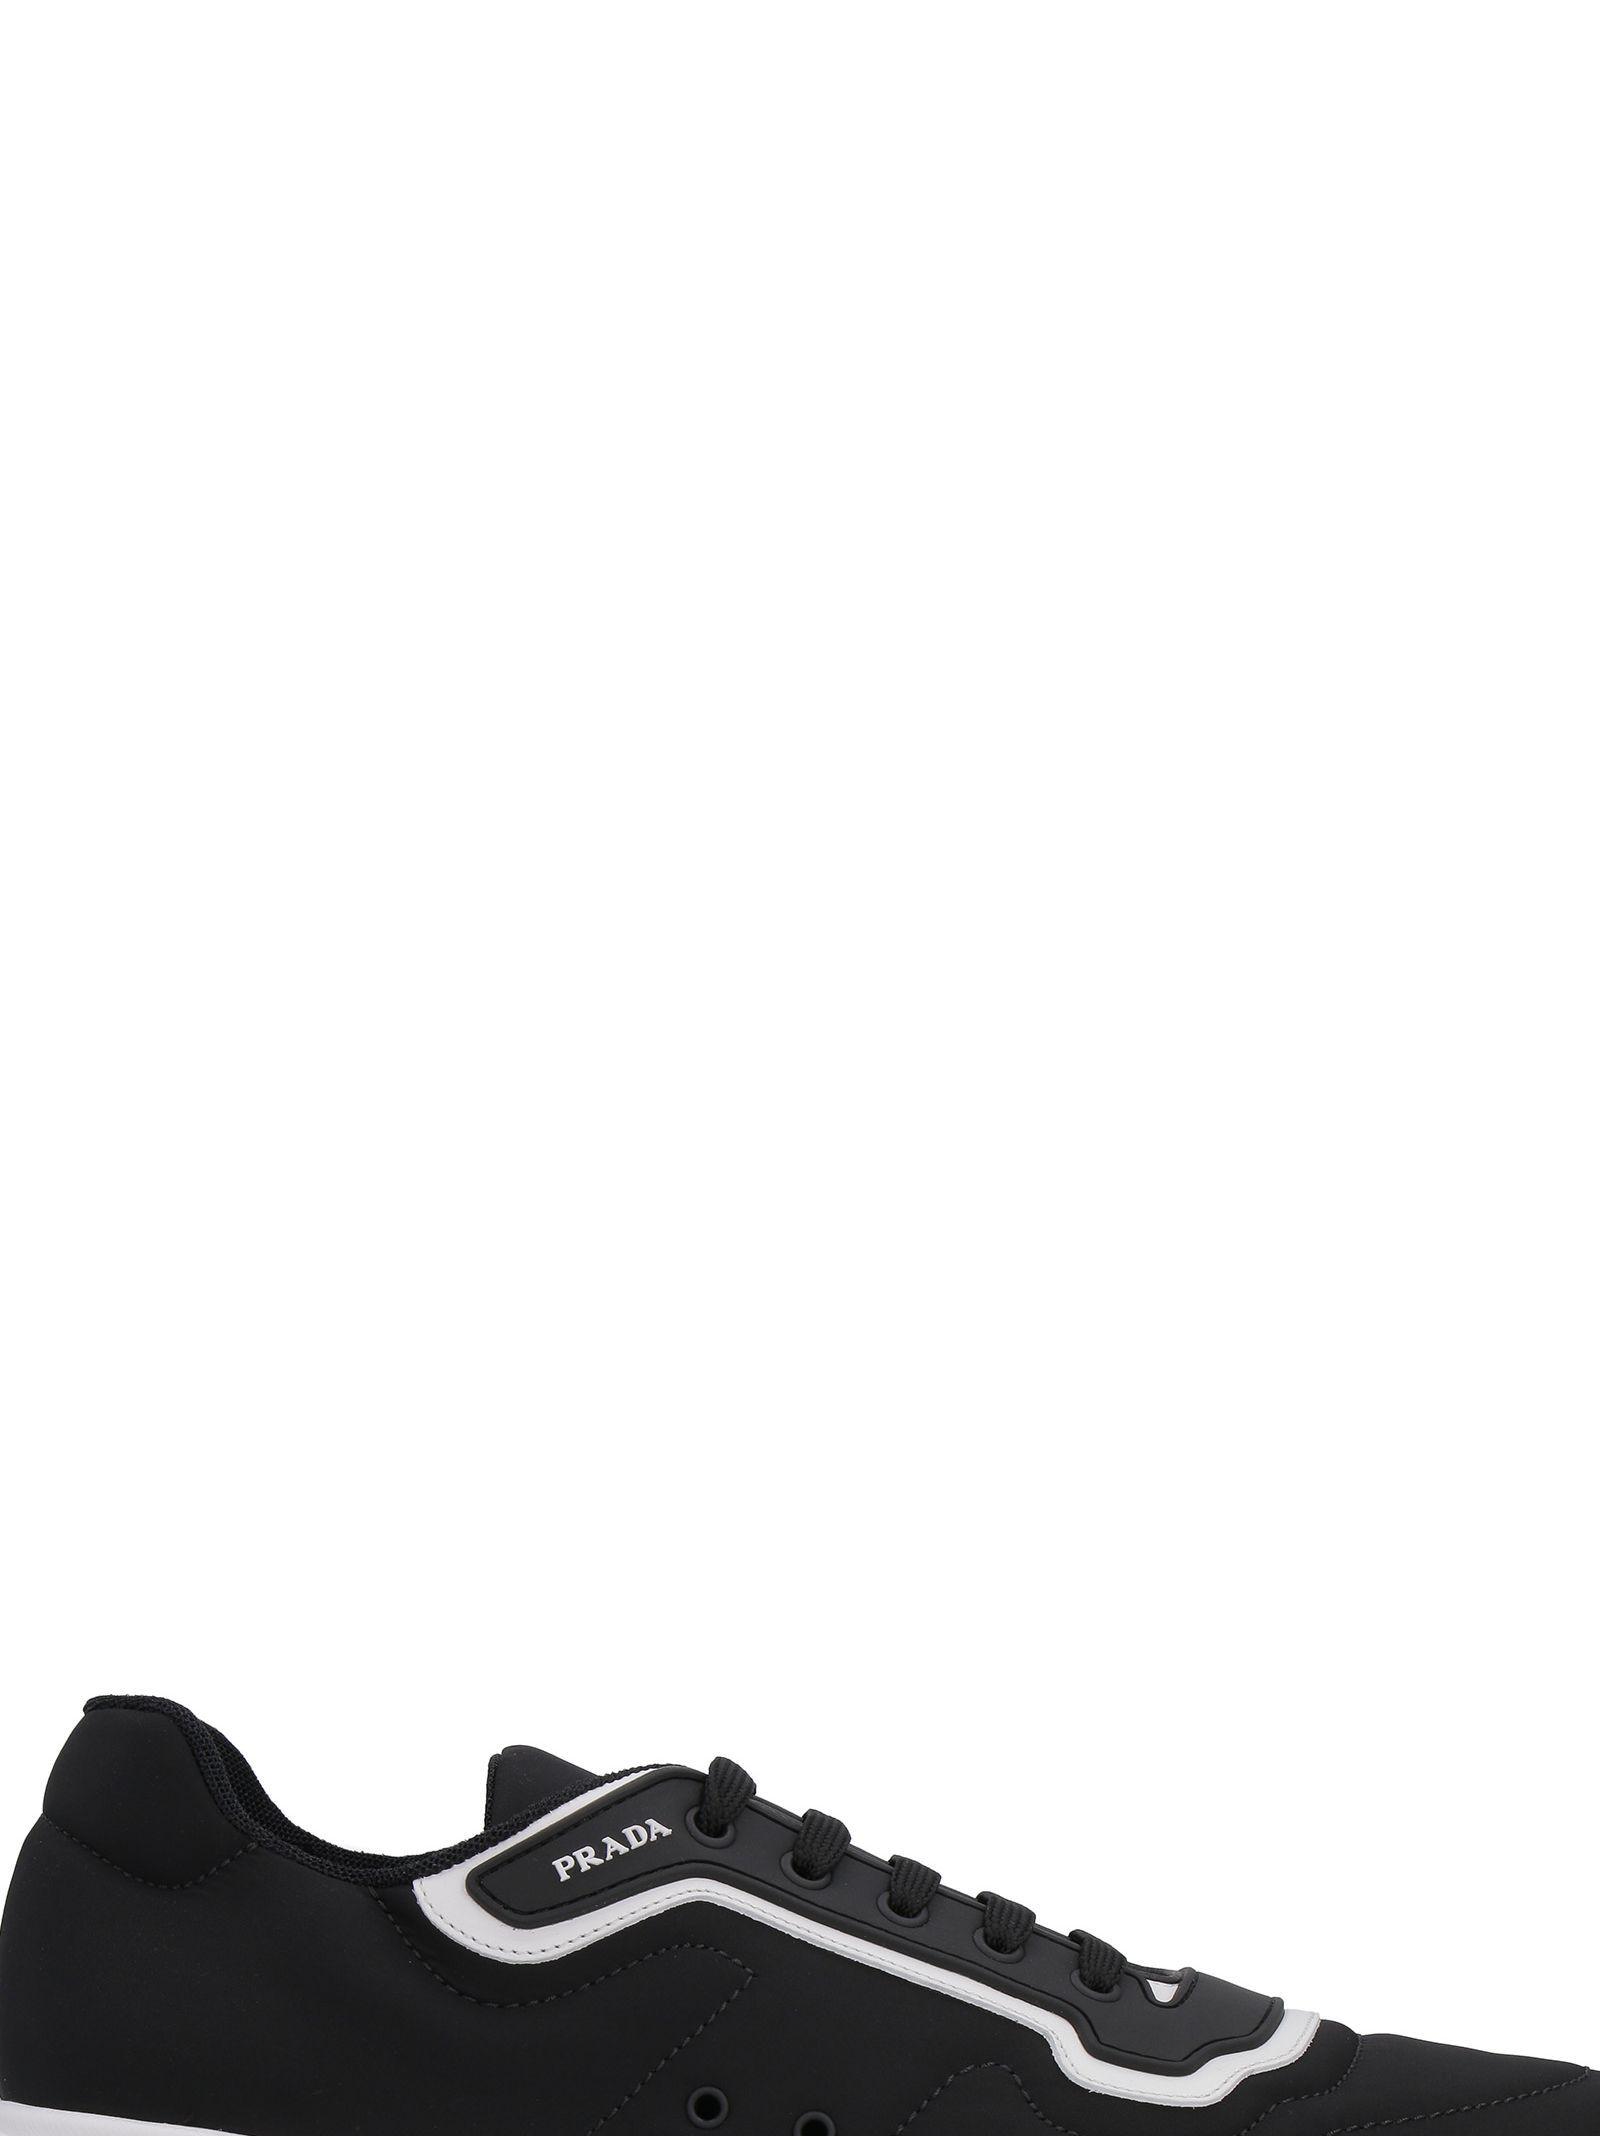 20bebf2f85 PRADA TECHNO FABRIC SNEAKERS. #prada #shoes   Prada in 2019 ...